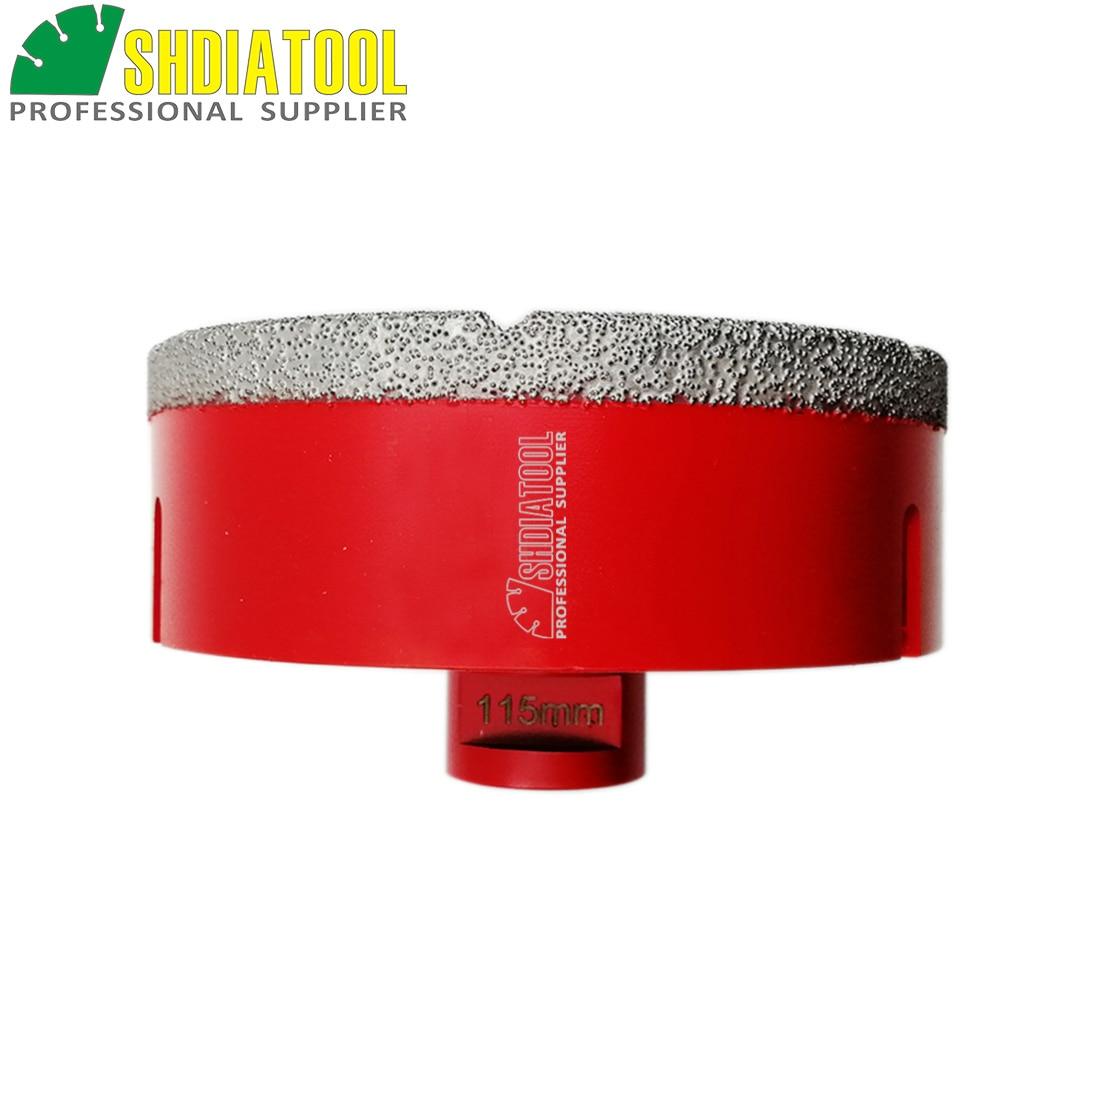 SHDIATOOL 115mm X 10mm Vacuum Brazed Diamond M14 Drilling Bit Drill Core Bit For Granite Marble Ceramic Artificial Stone